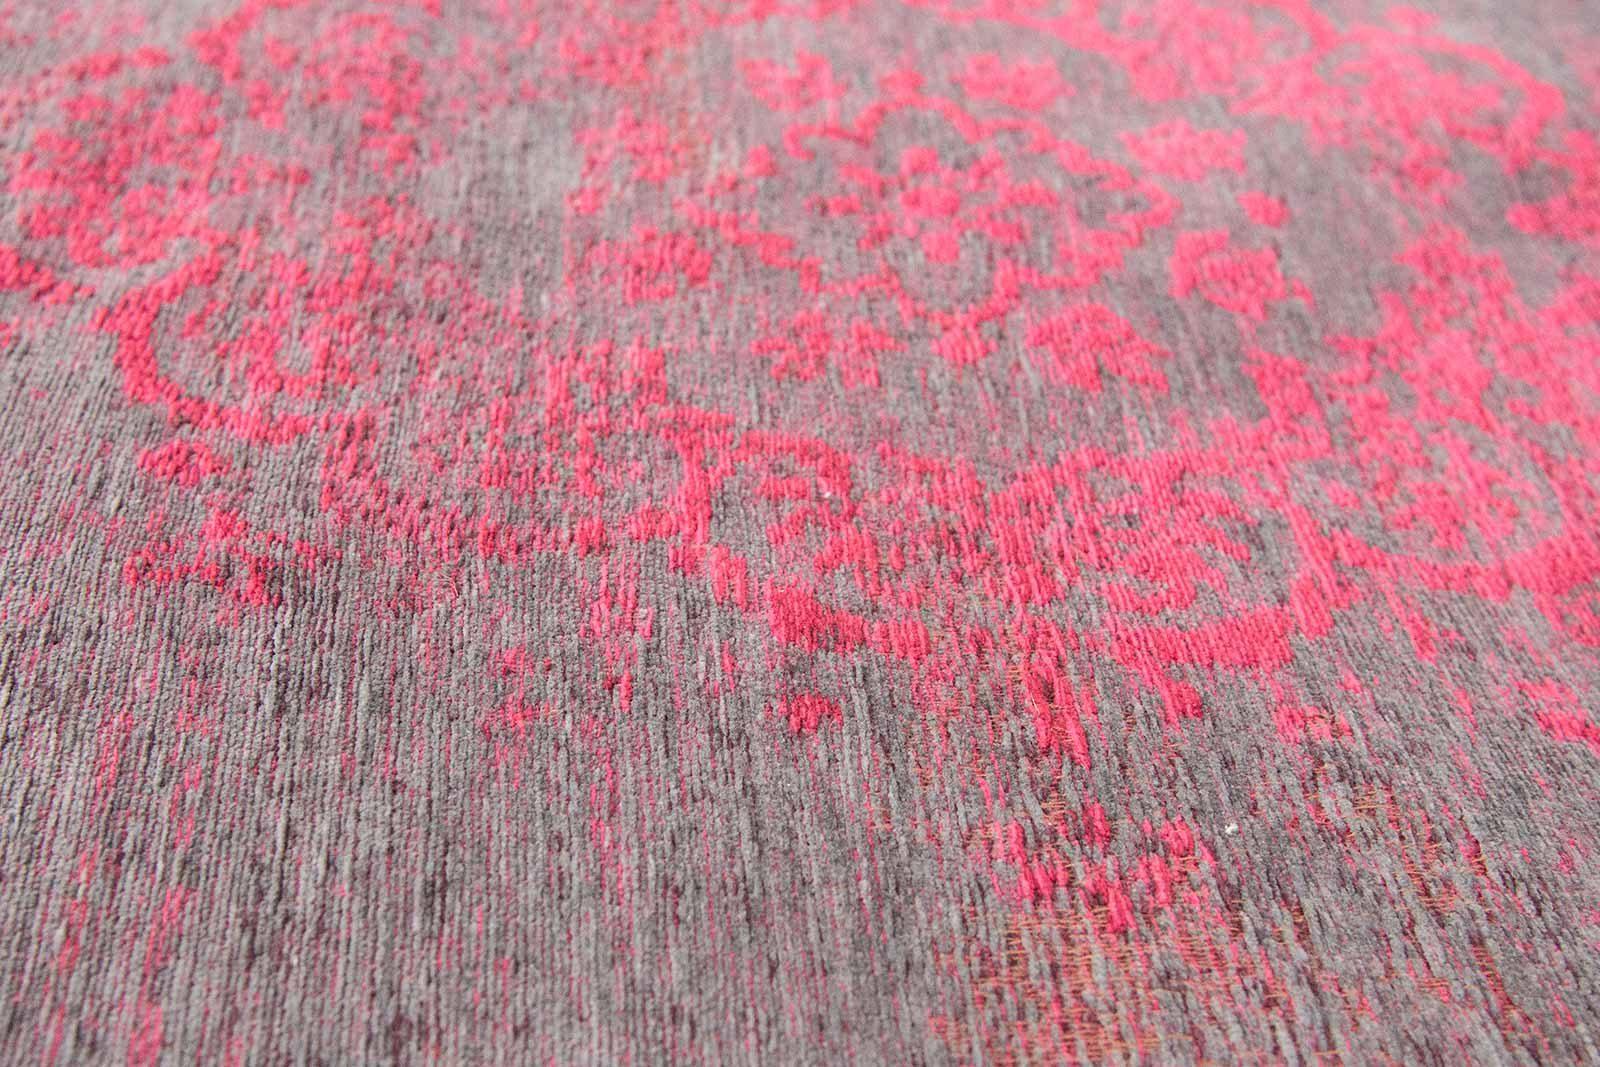 tapijt Louis De Poortere LX8261 Fading World Medaillon Pink Flash zoom